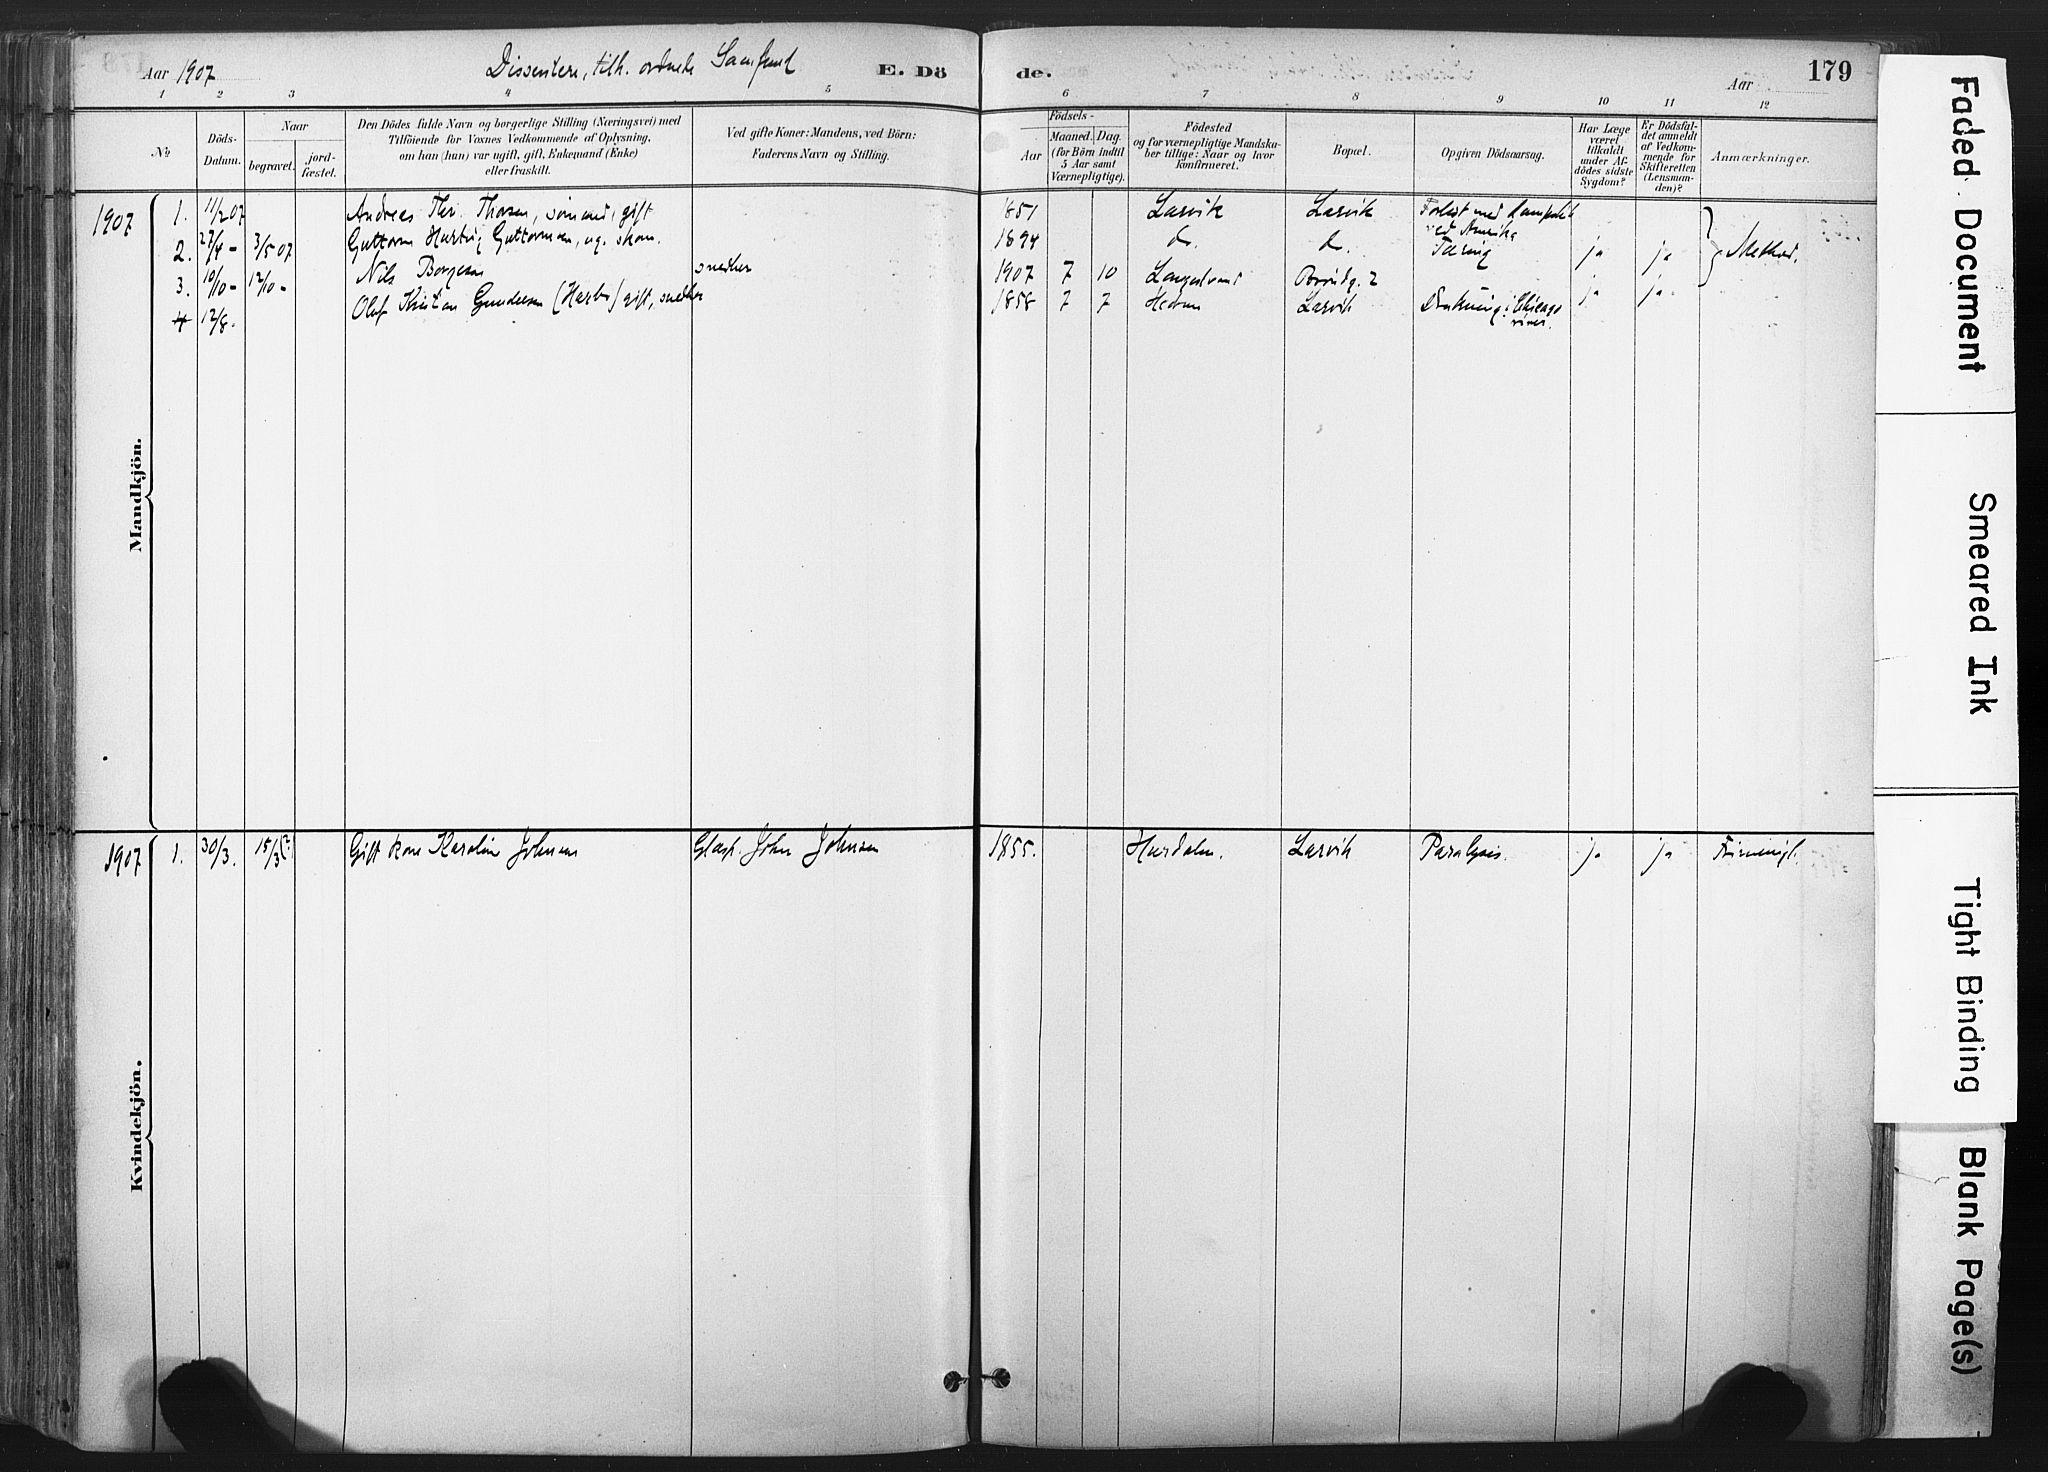 SAKO, Larvik kirkebøker, F/Fa/L0010: Ministerialbok nr. I 10, 1884-1910, s. 179